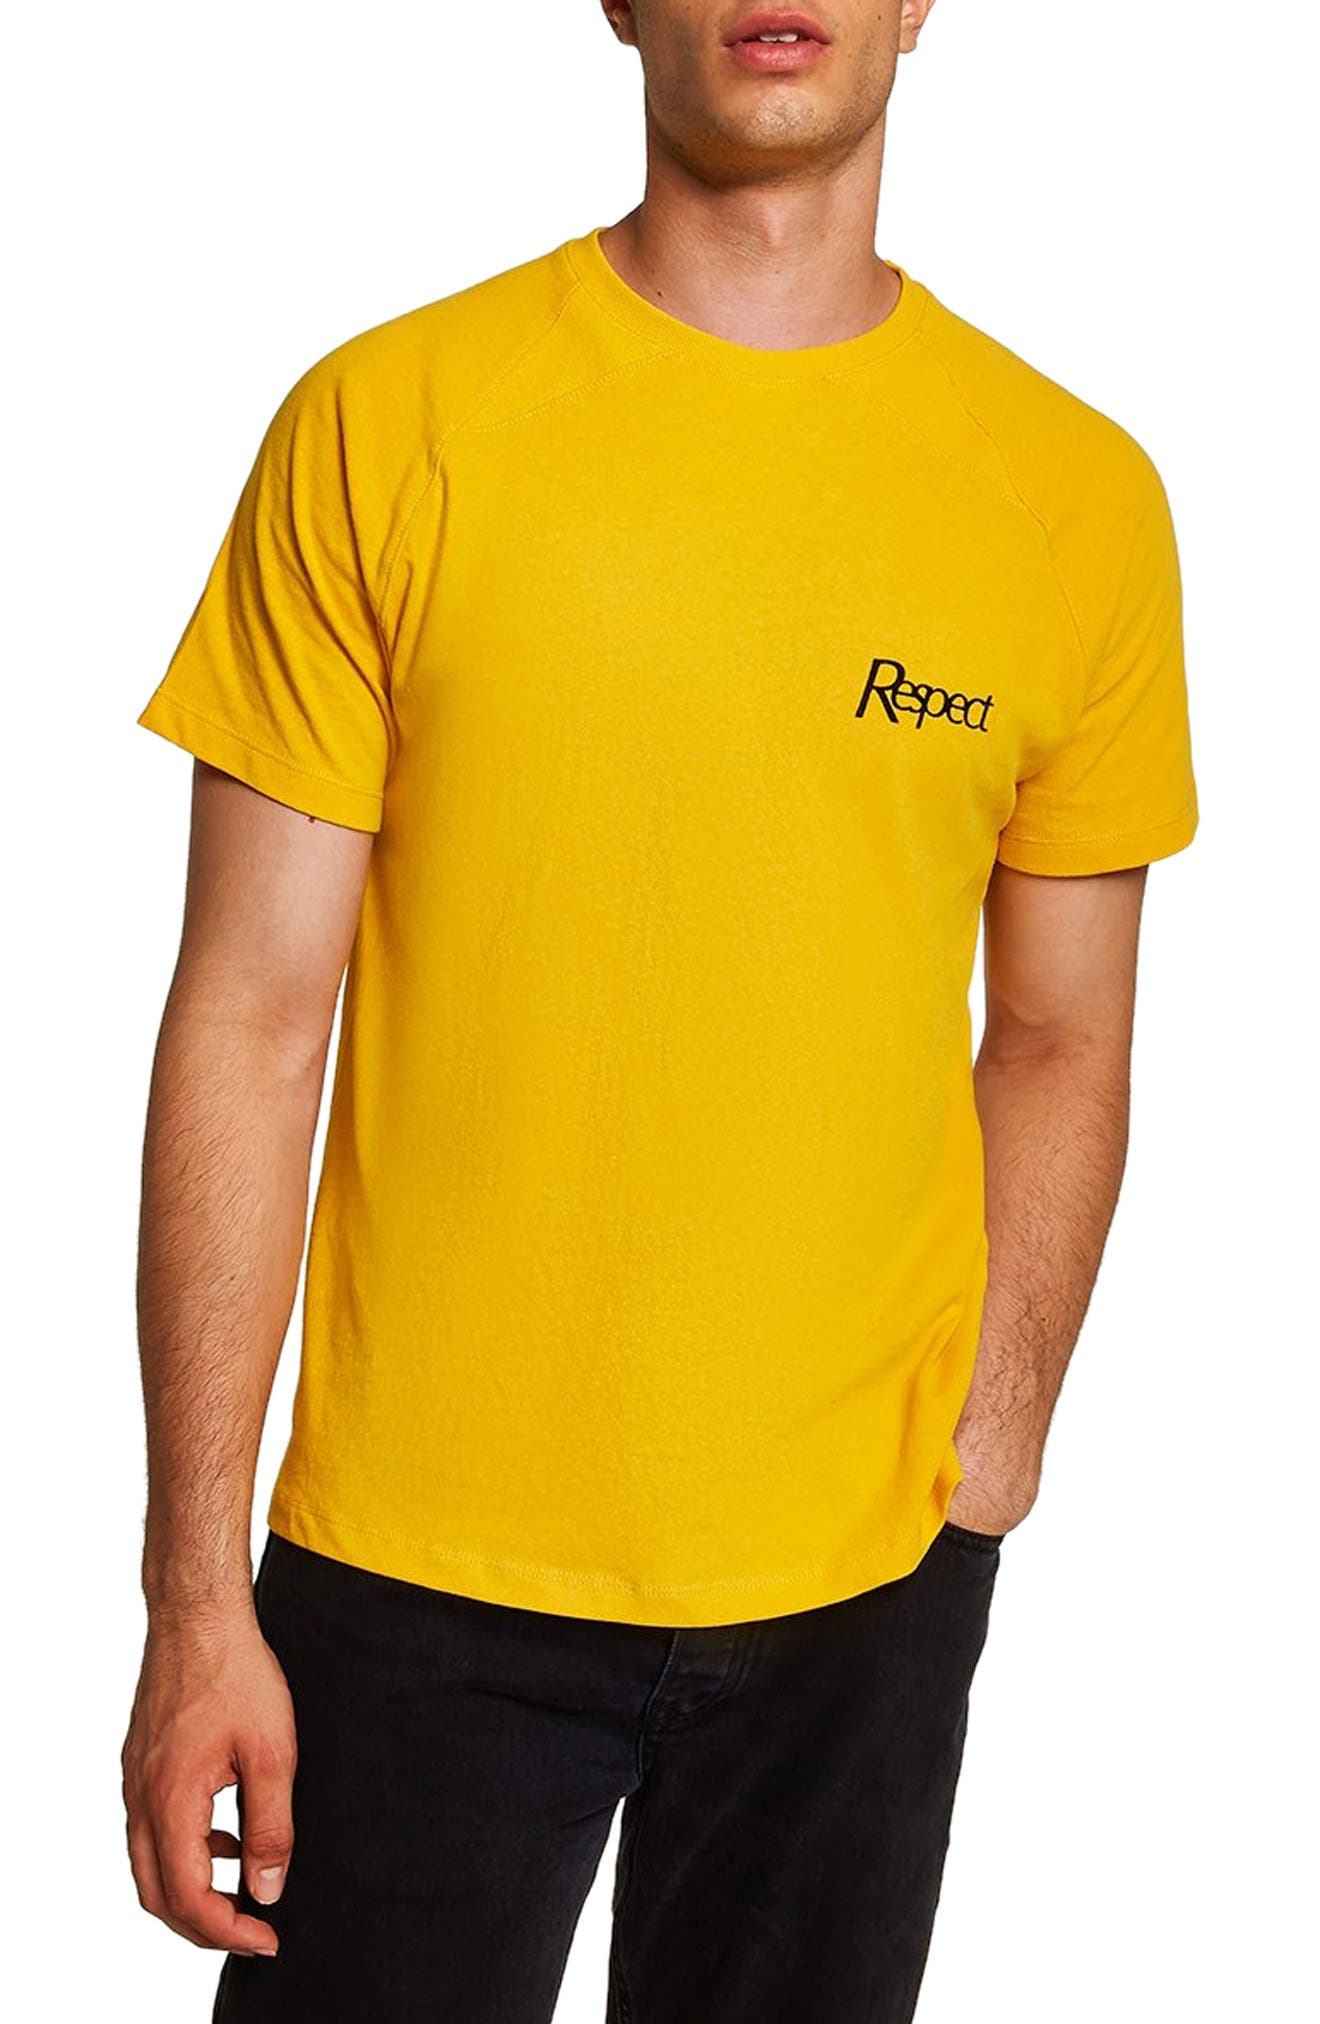 Respect Classic Fit T-Shirt,                         Main,                         color, 710